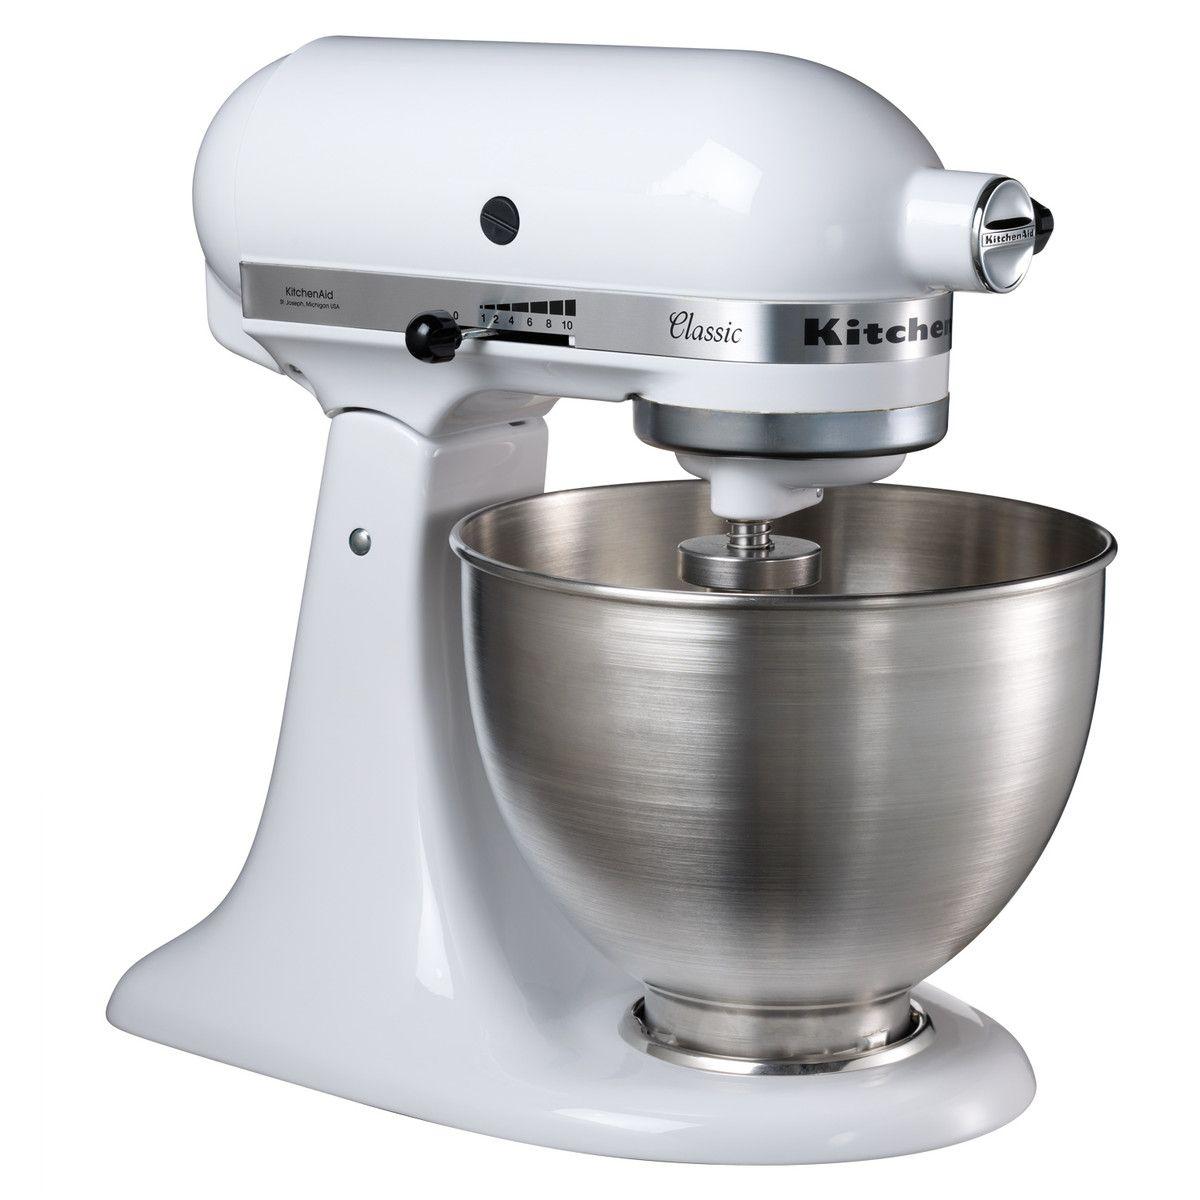 Classic Küchenmaschine 4,3 l von KitchenAid   Kitchenaid classic ...